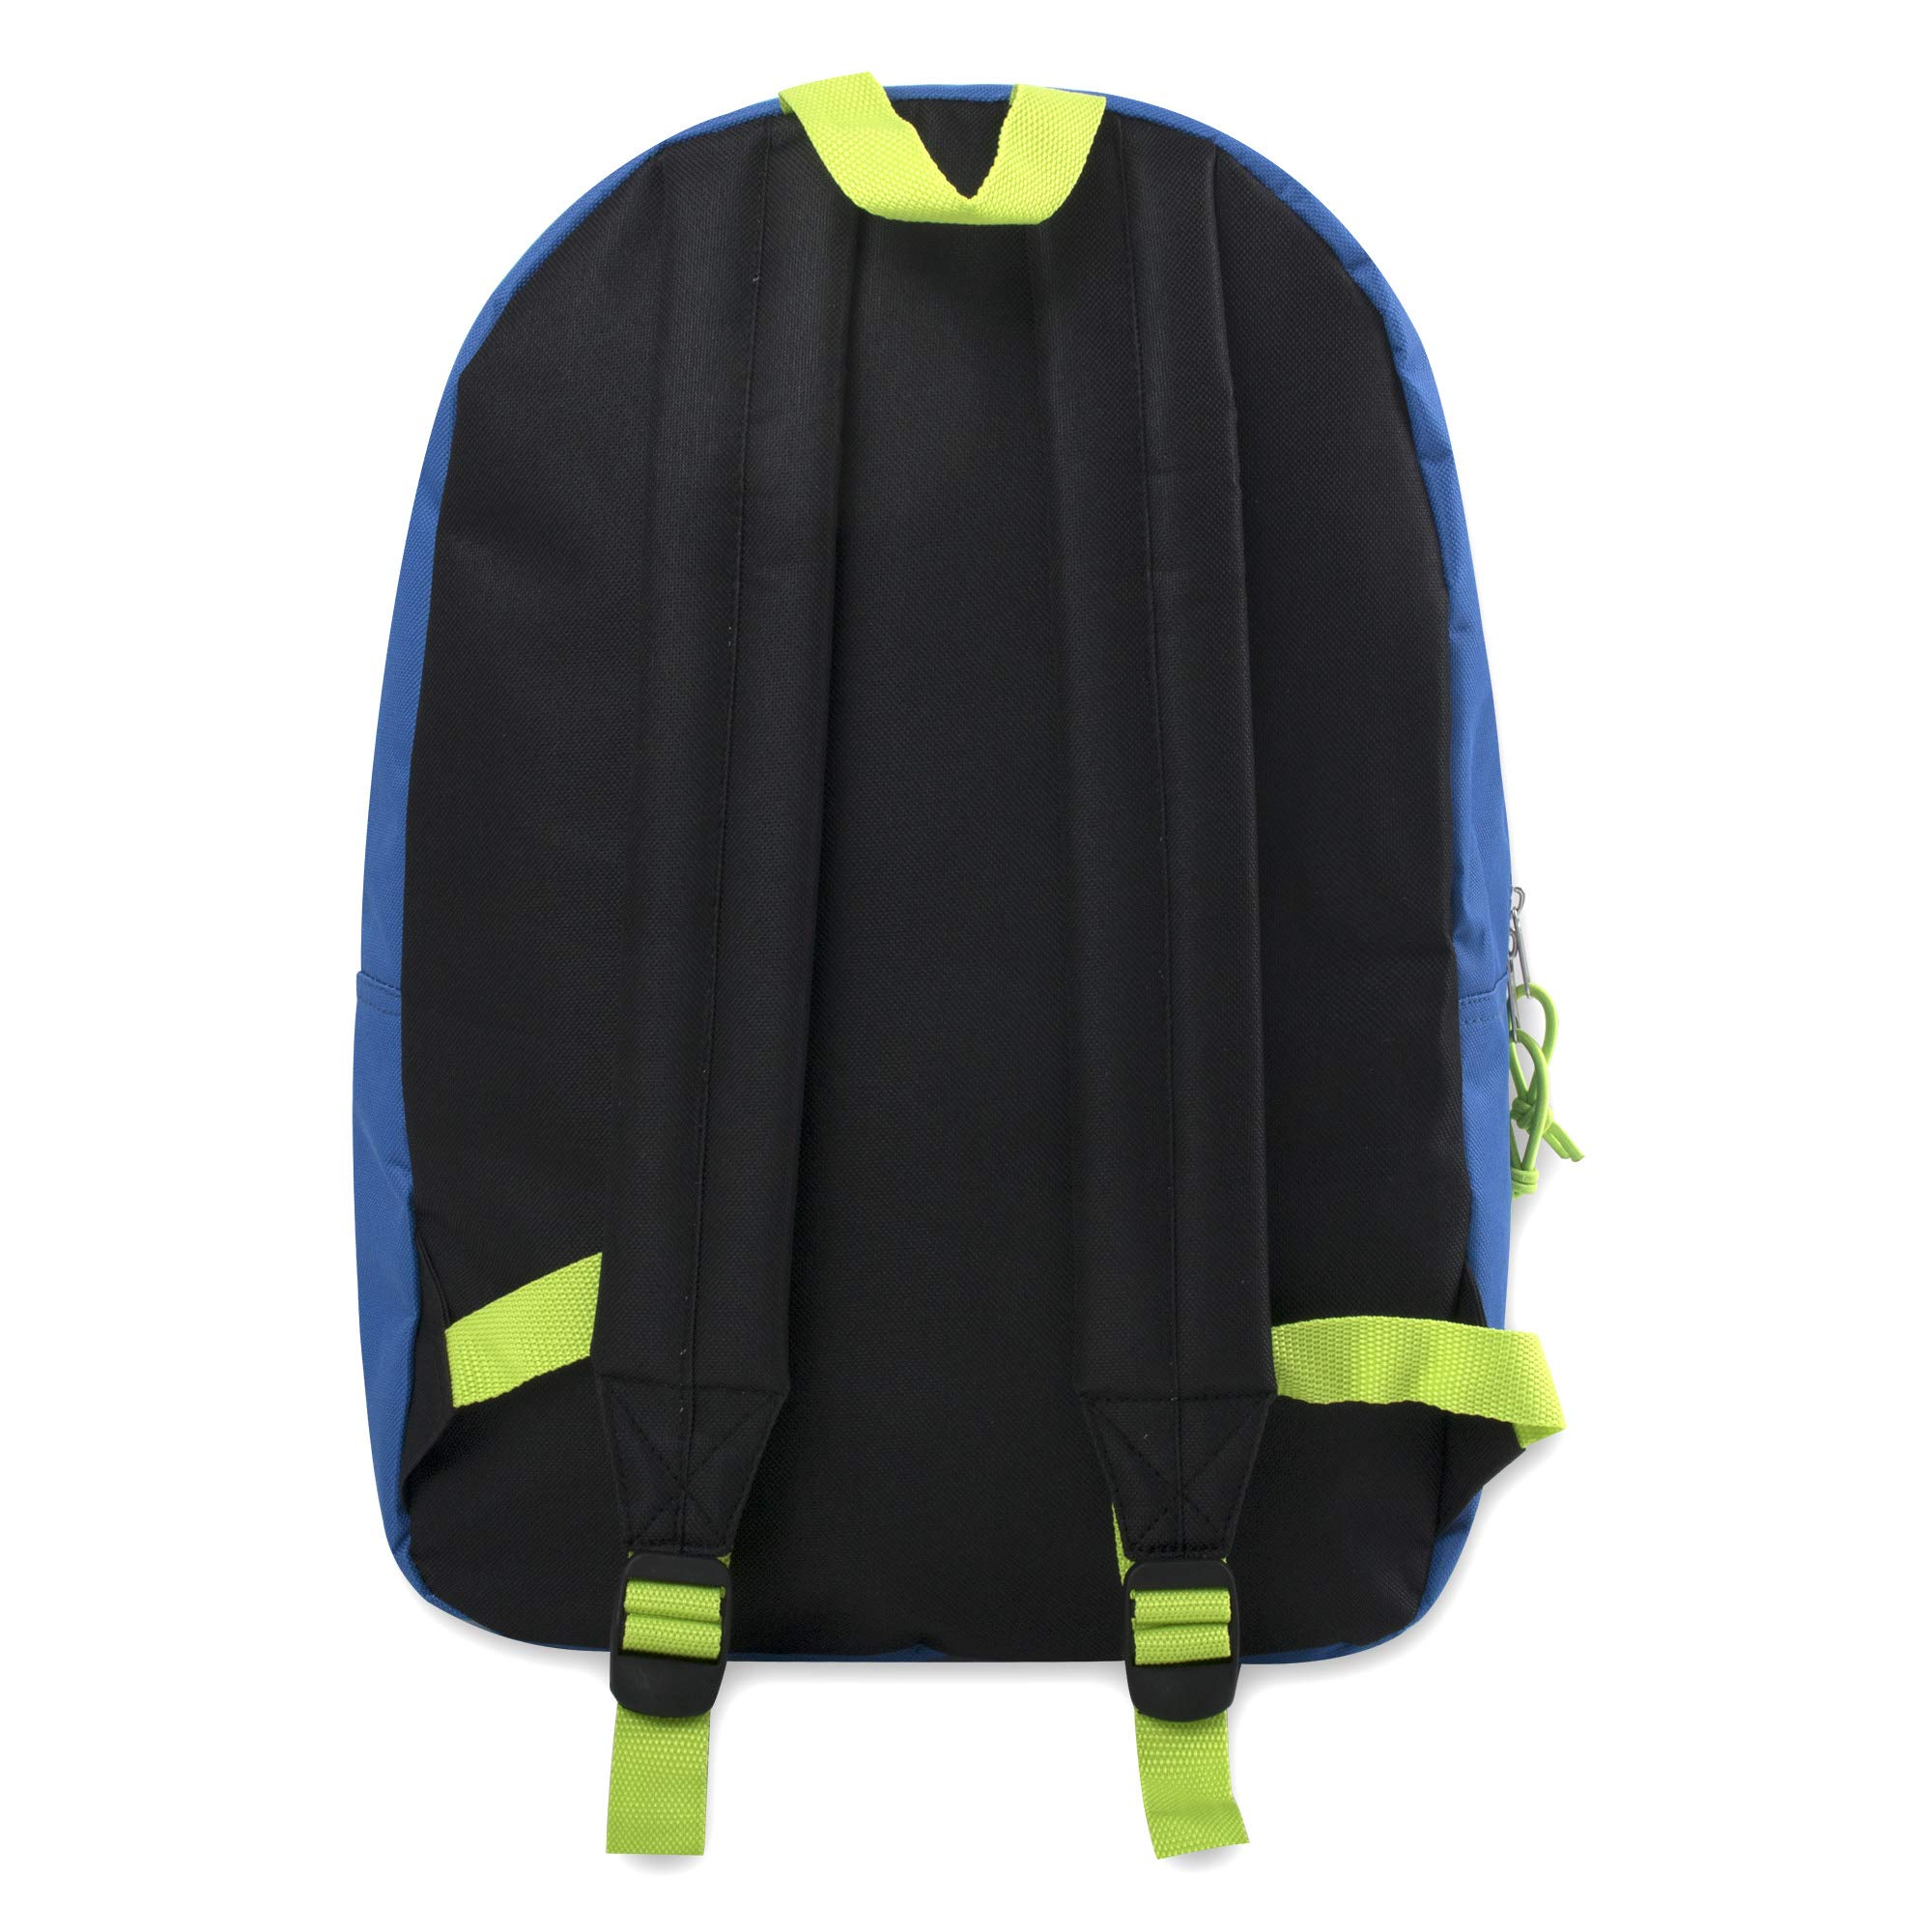 17'' Trailmaker Backpack Bookbag (Blue (01)) by Trail maker (Image #2)